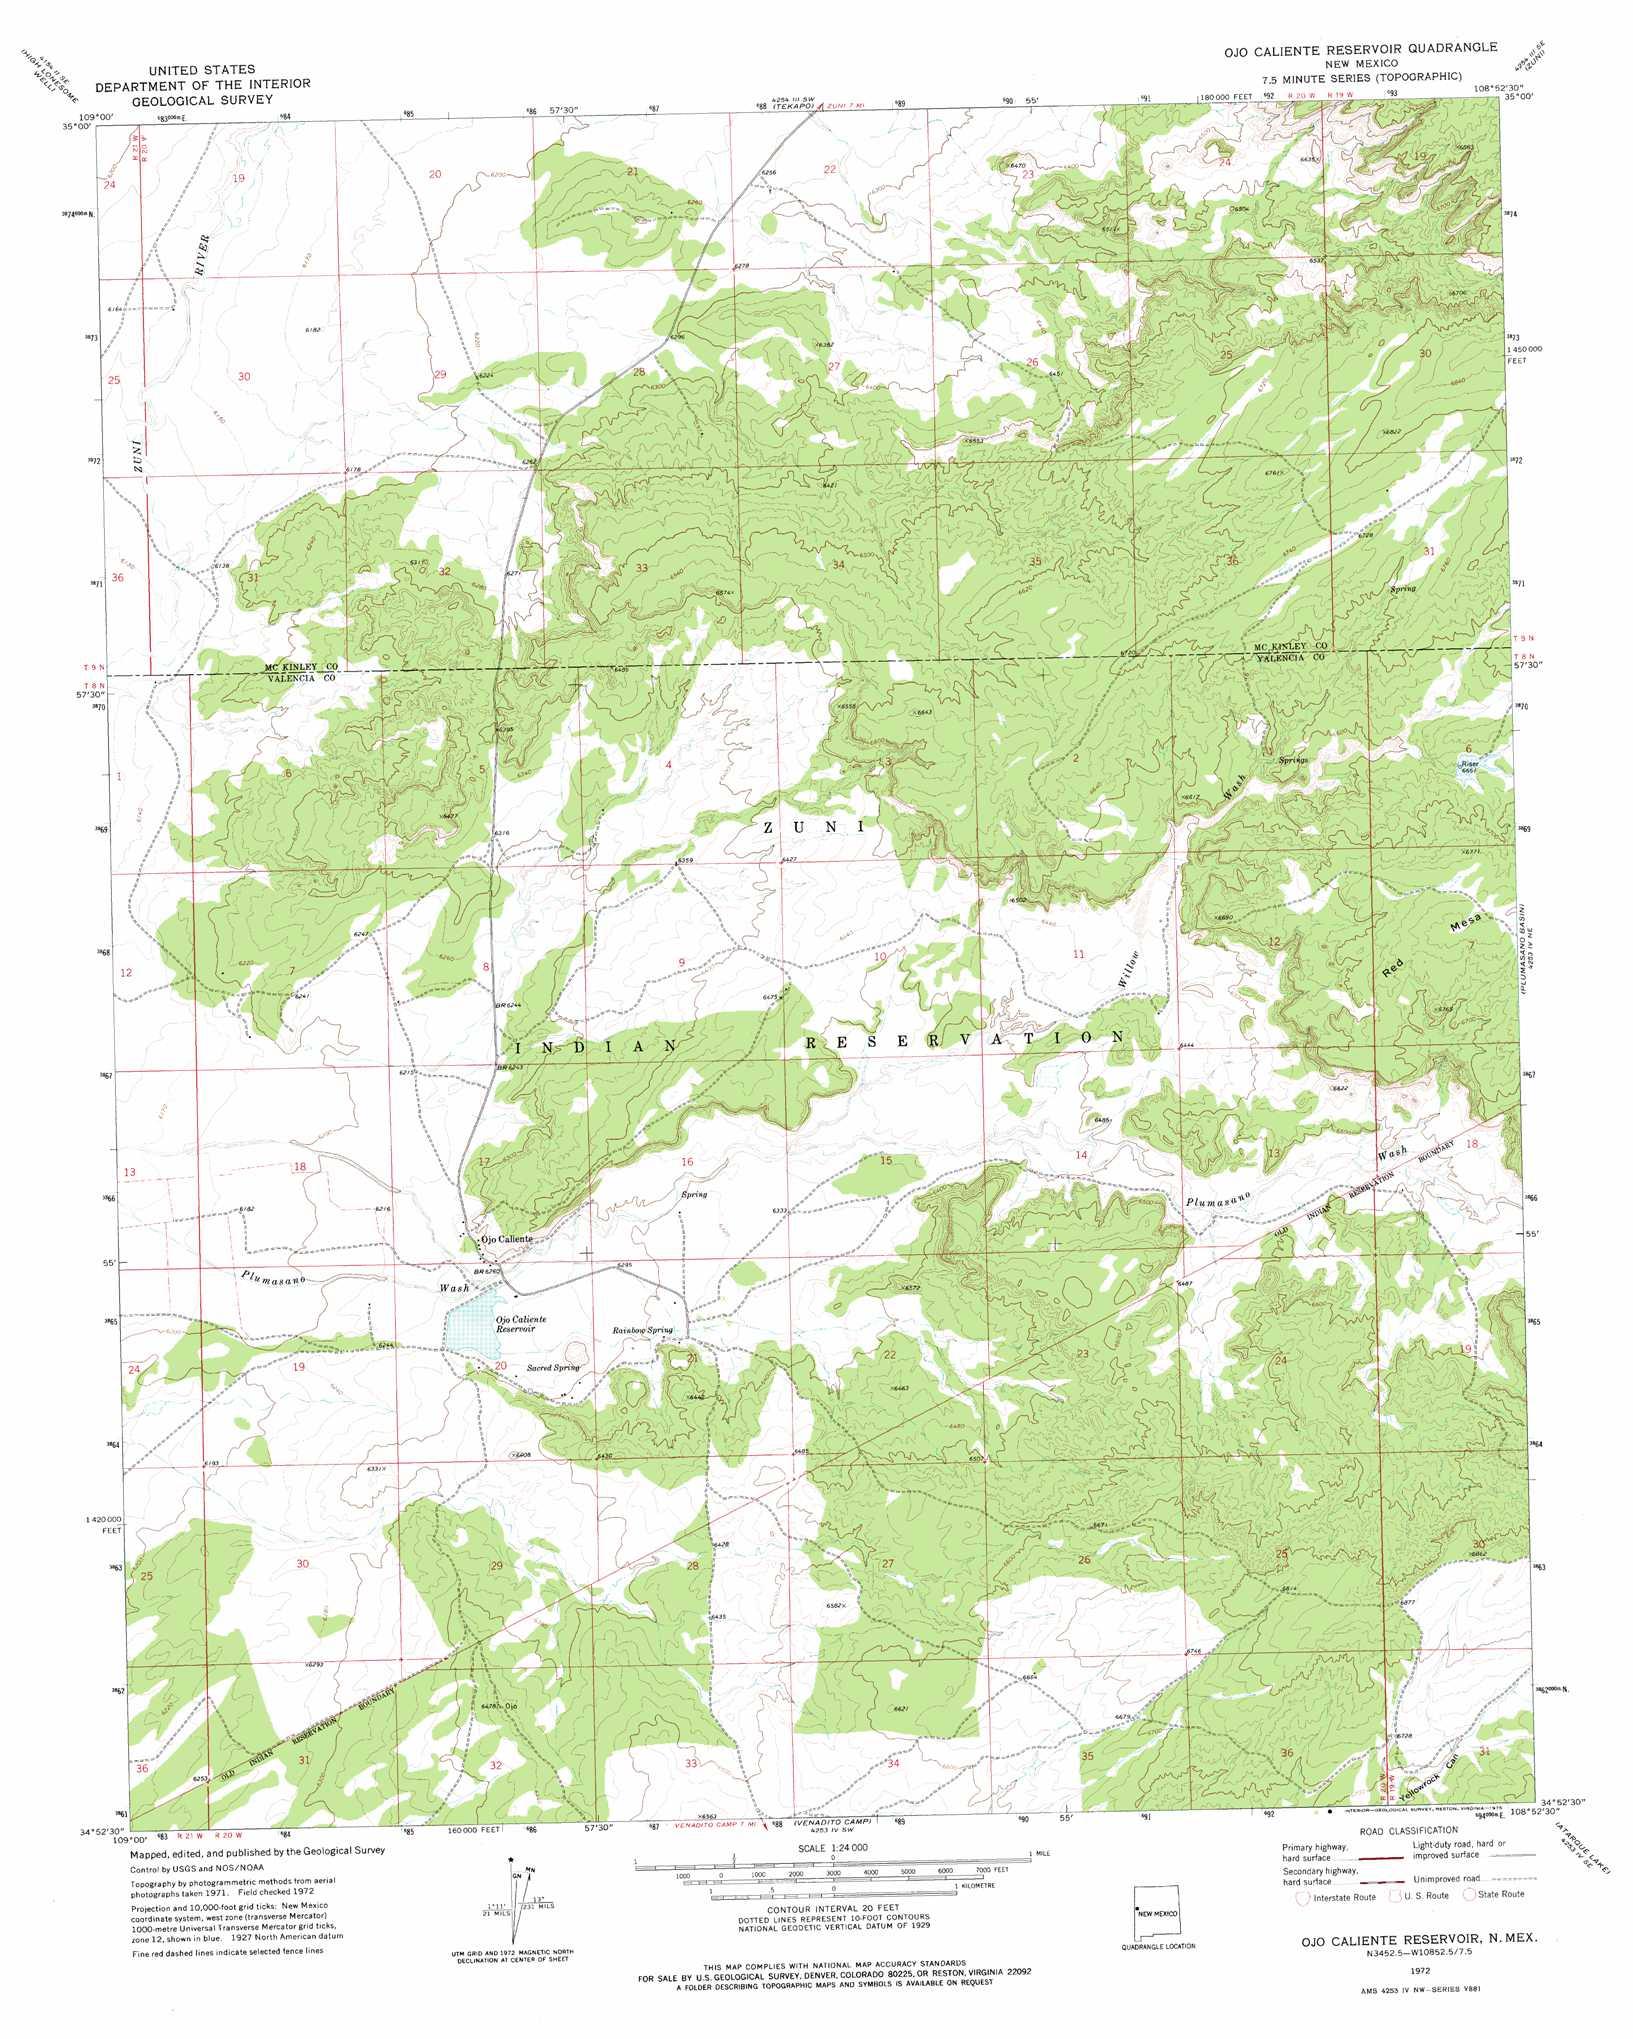 Ojo Caliente New Mexico Map.Ojo Caliente Reservoir Topographic Map Nm Usgs Topo Quad 34108h8